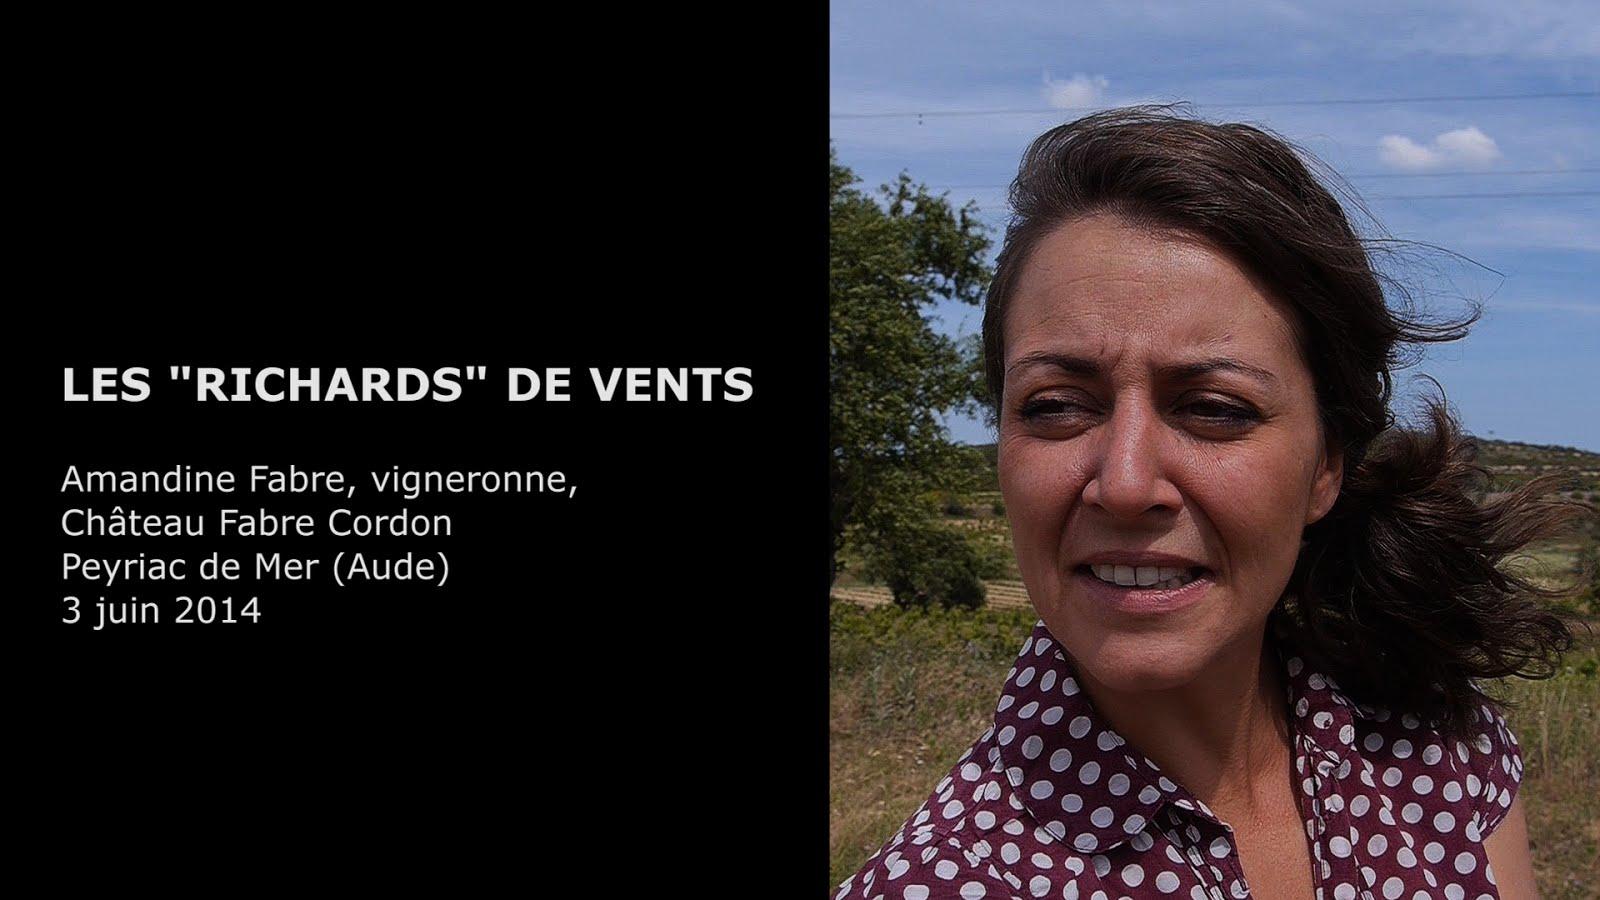 Amandine Fabre, vigneronne